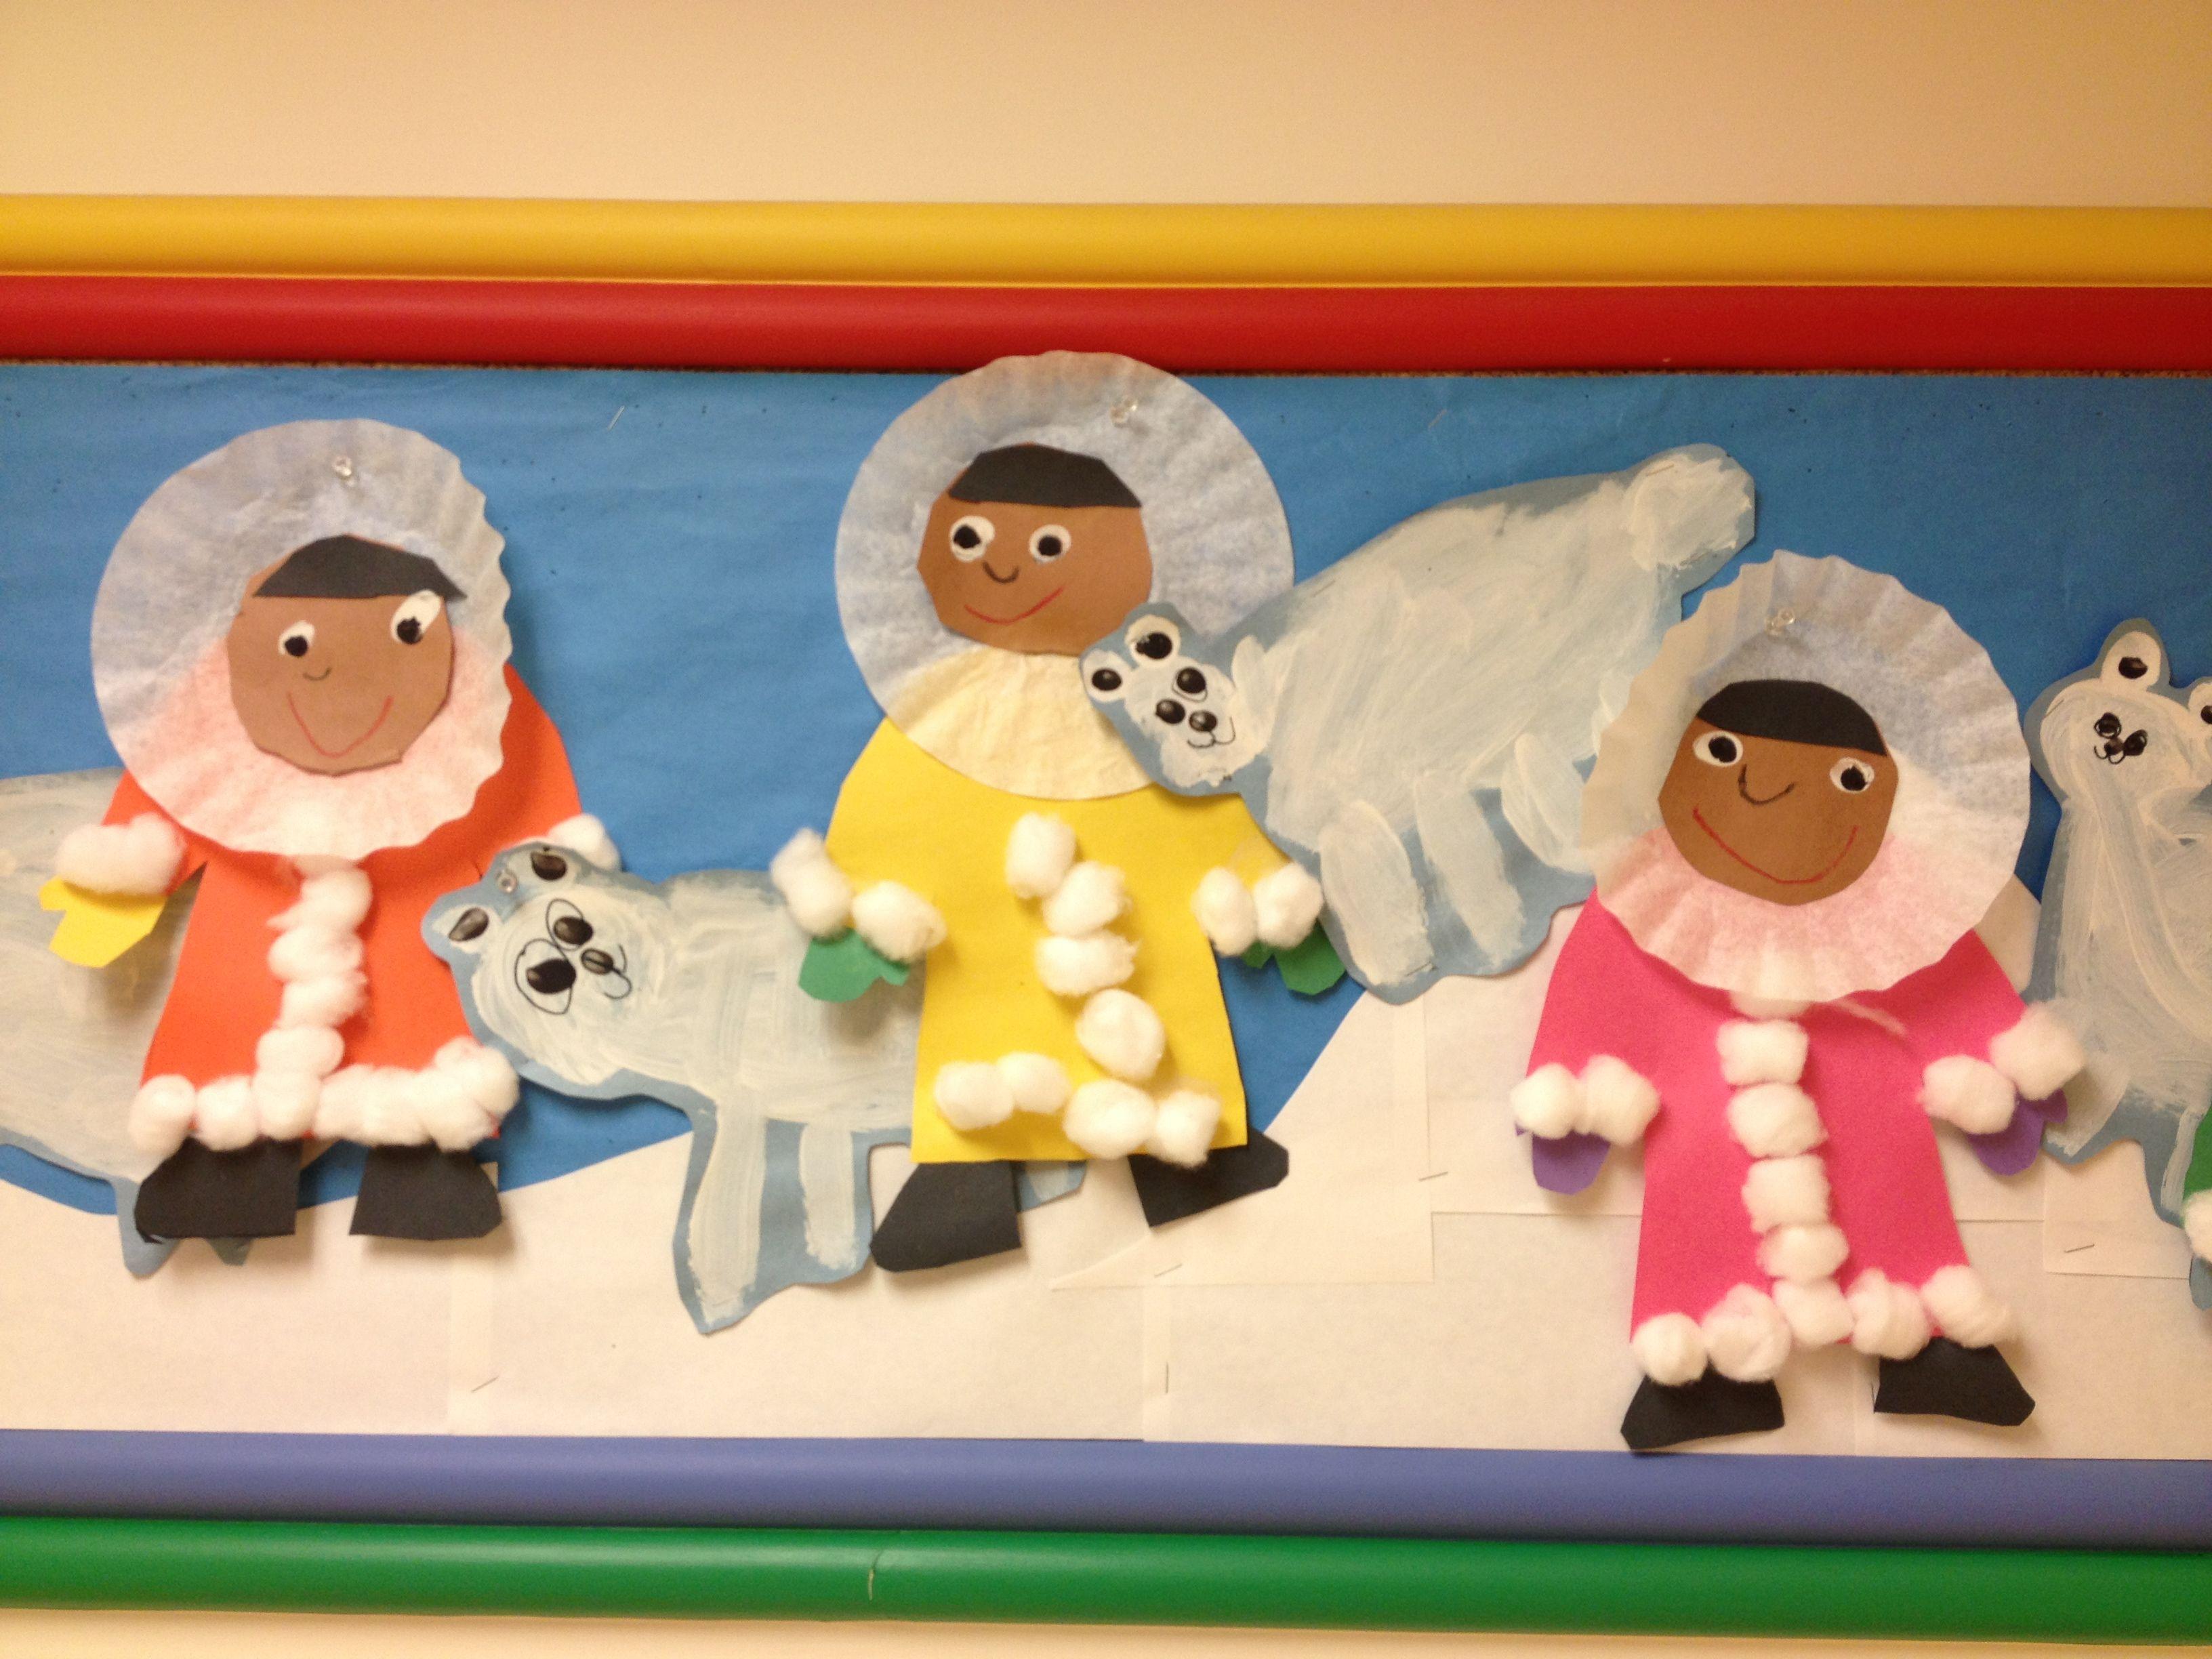 eskimos eisb ren kids art pinterest kindergarten grundschule and schule. Black Bedroom Furniture Sets. Home Design Ideas